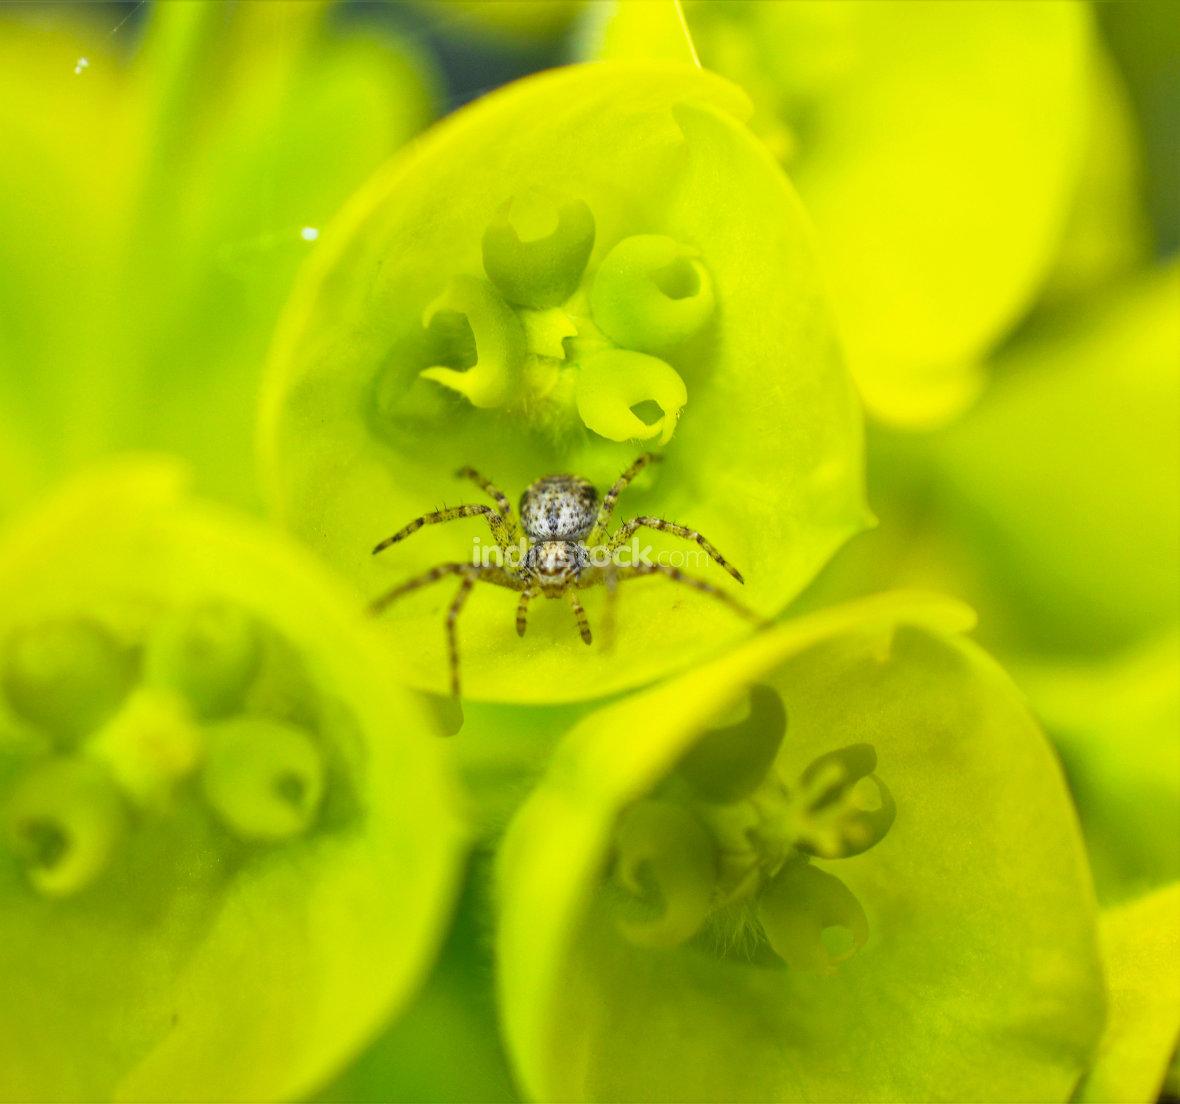 spider on a spring flower close up